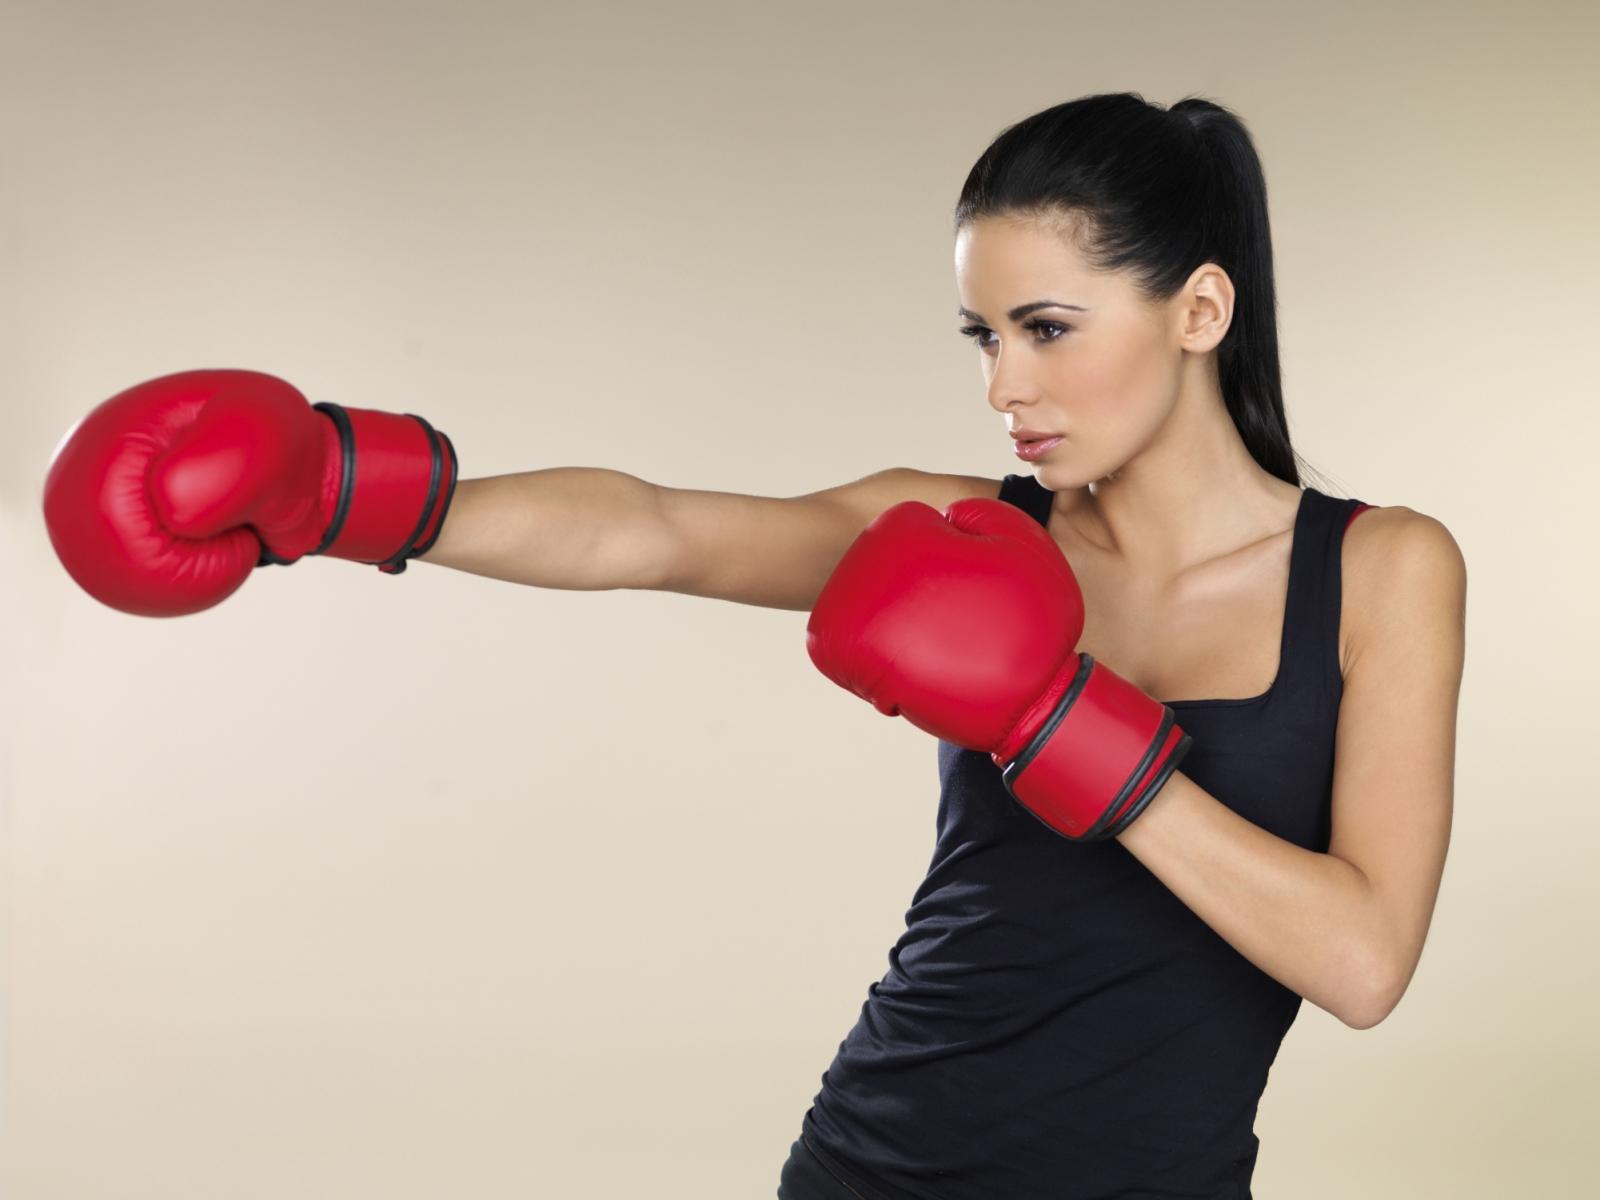 Фото на аву девушки в боксе